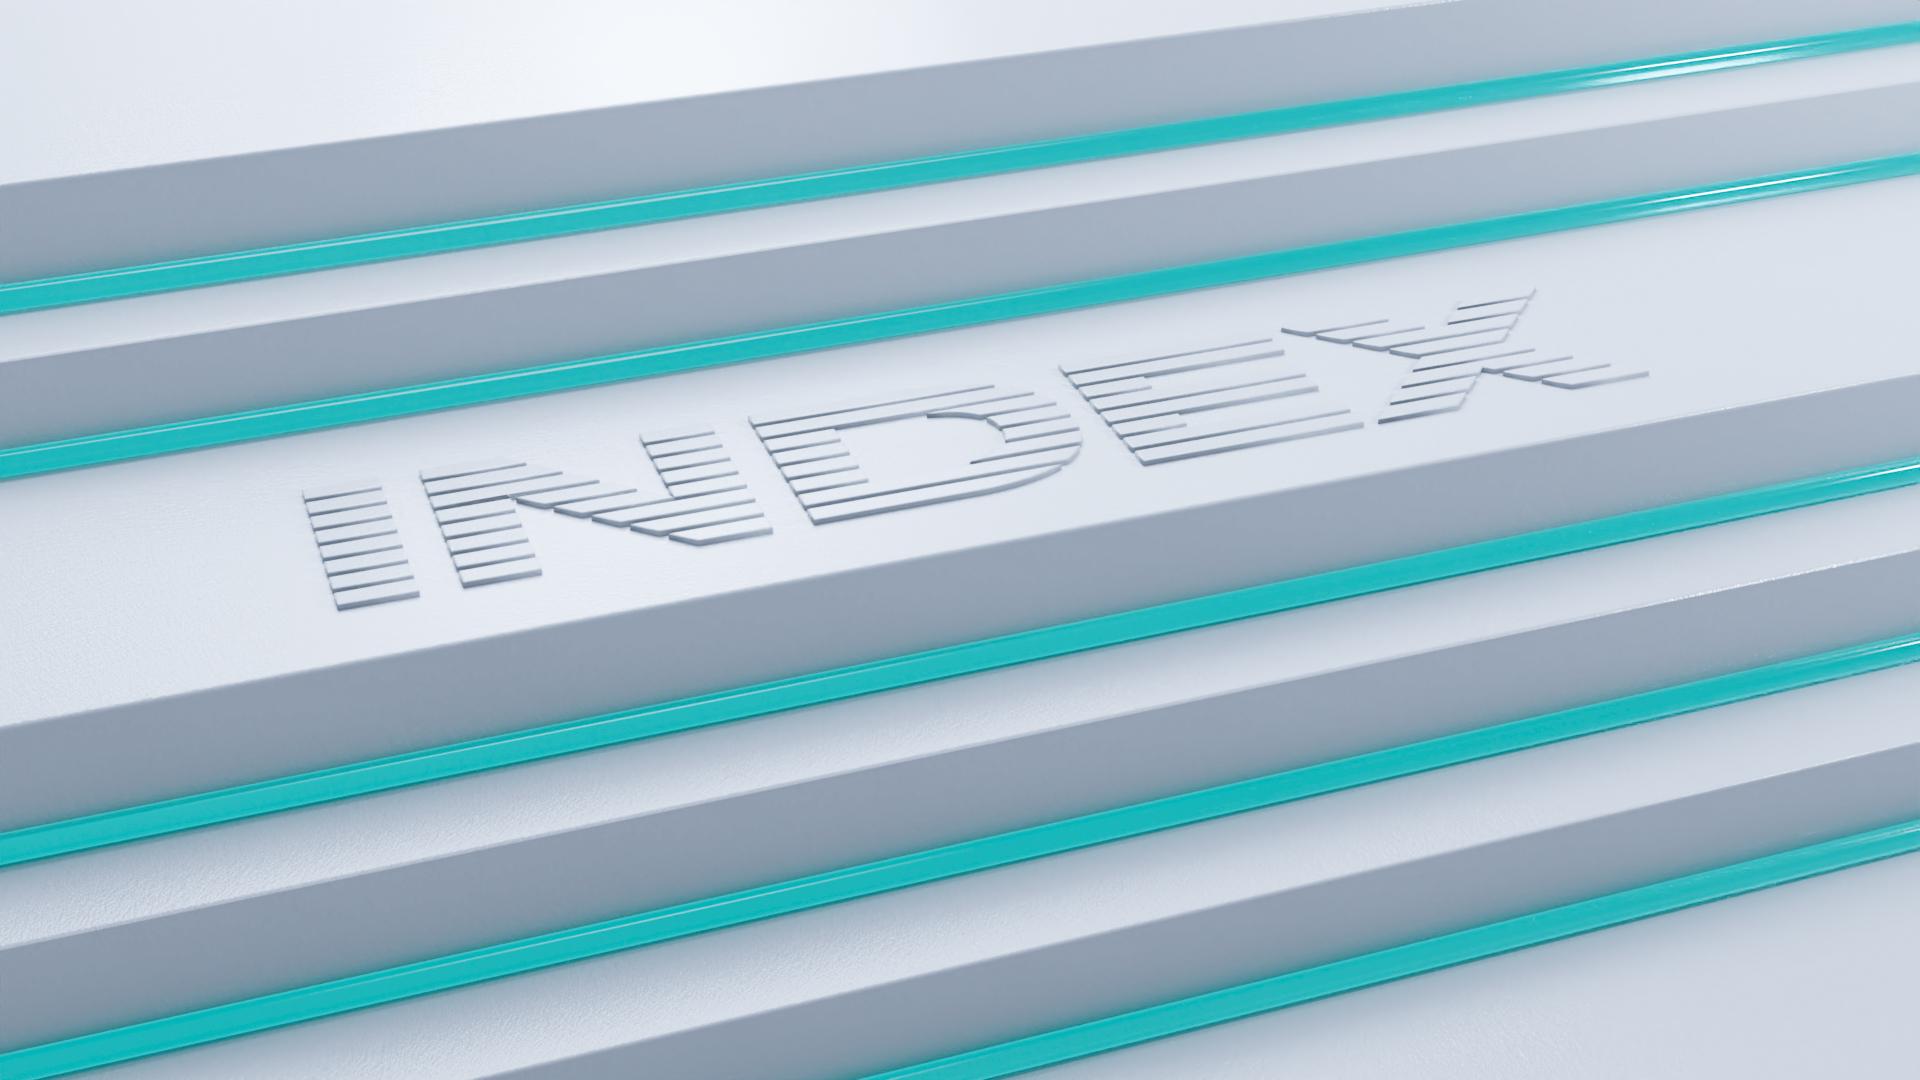 Index_Stripes_02